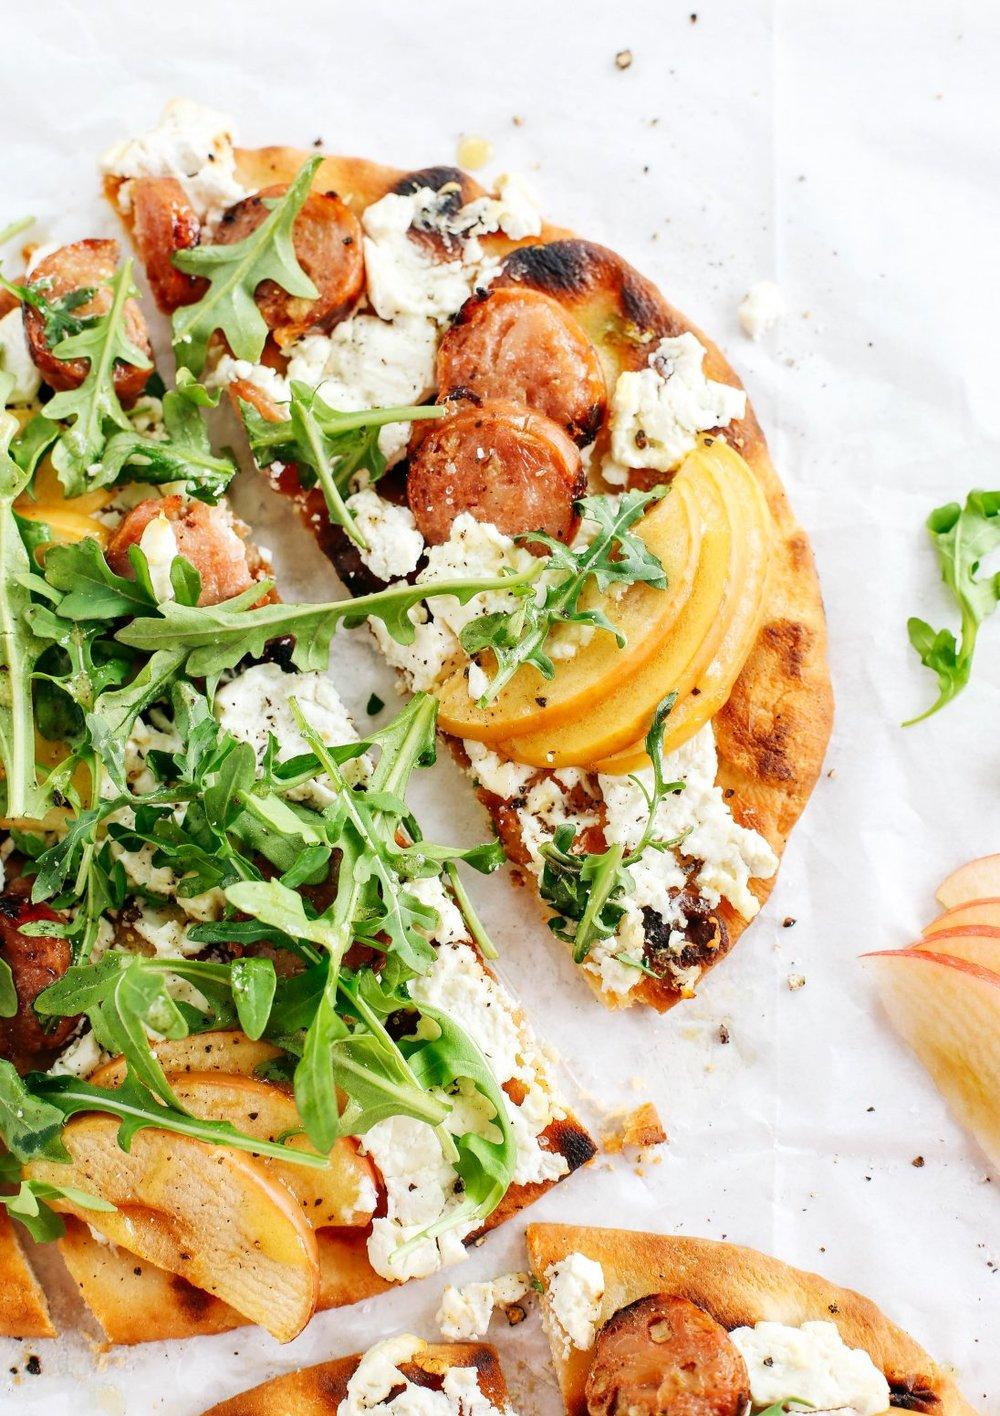 sausage-pizza-22-1096x1552.jpg